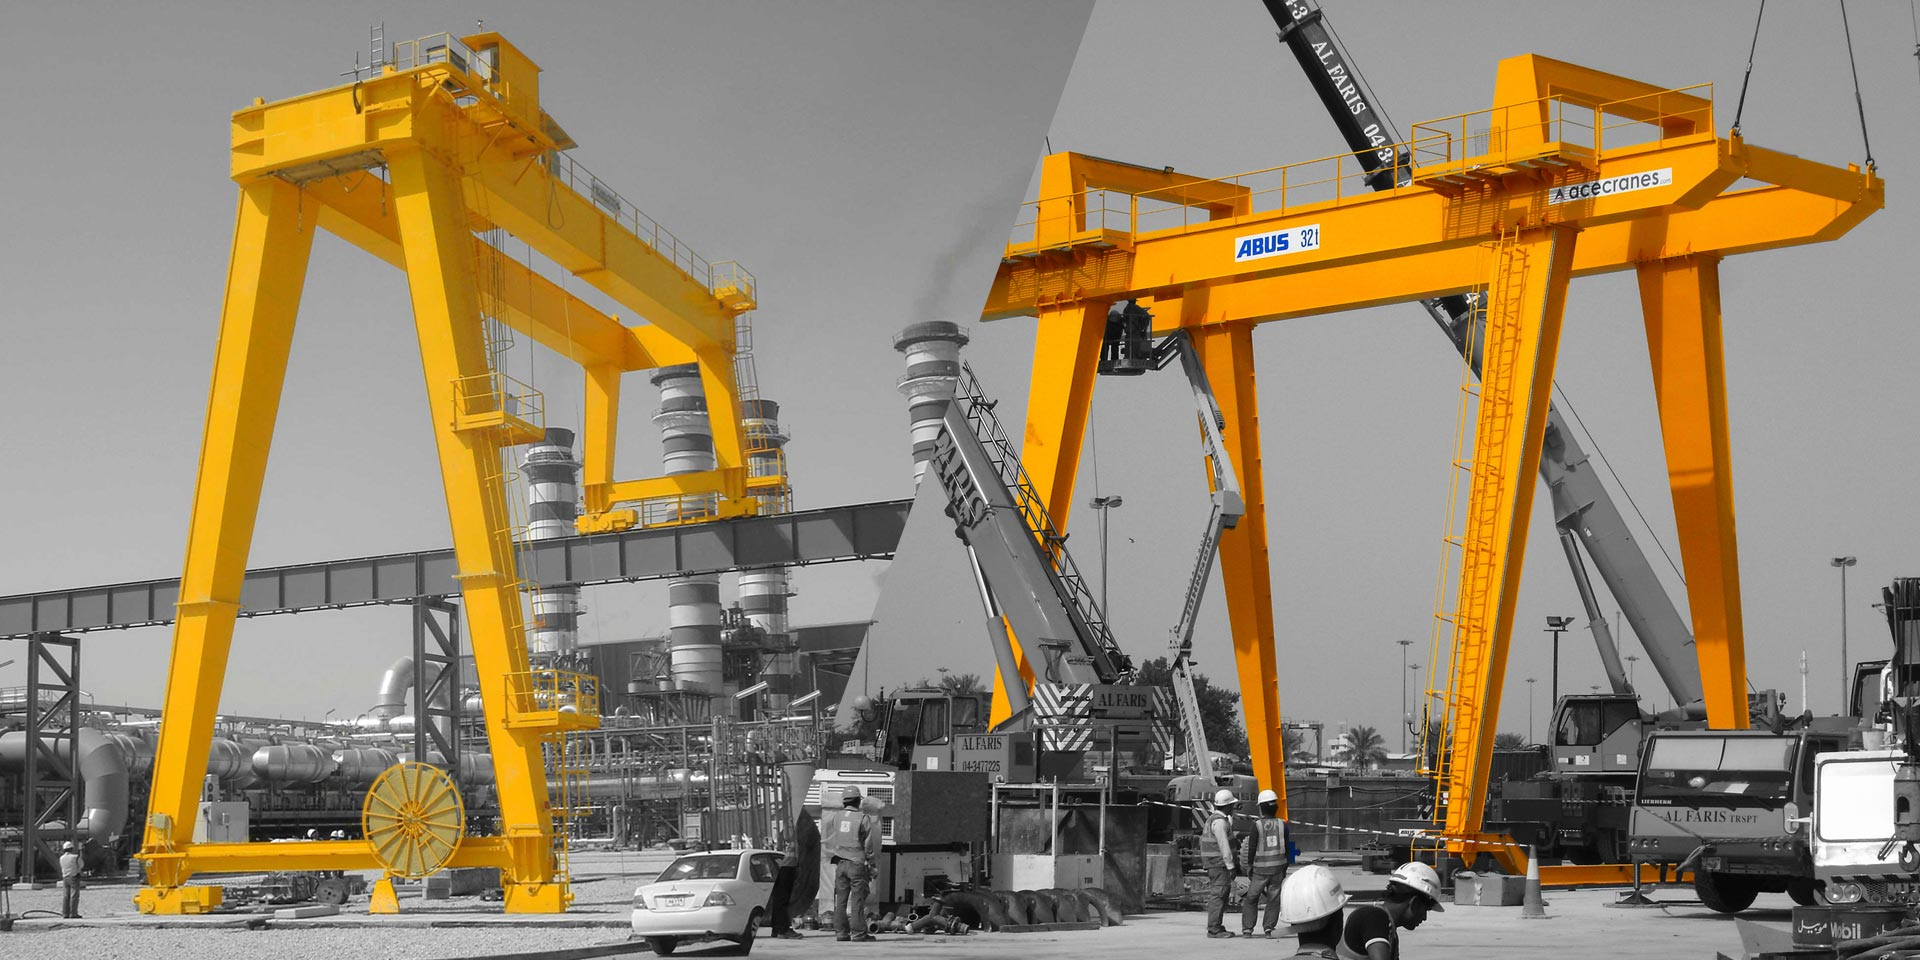 Double-Girder-Goliath-Cranes-Cranes-Maufacturing-uae-ABUS-cranes-Ace-Carnes-Cover-Page-1